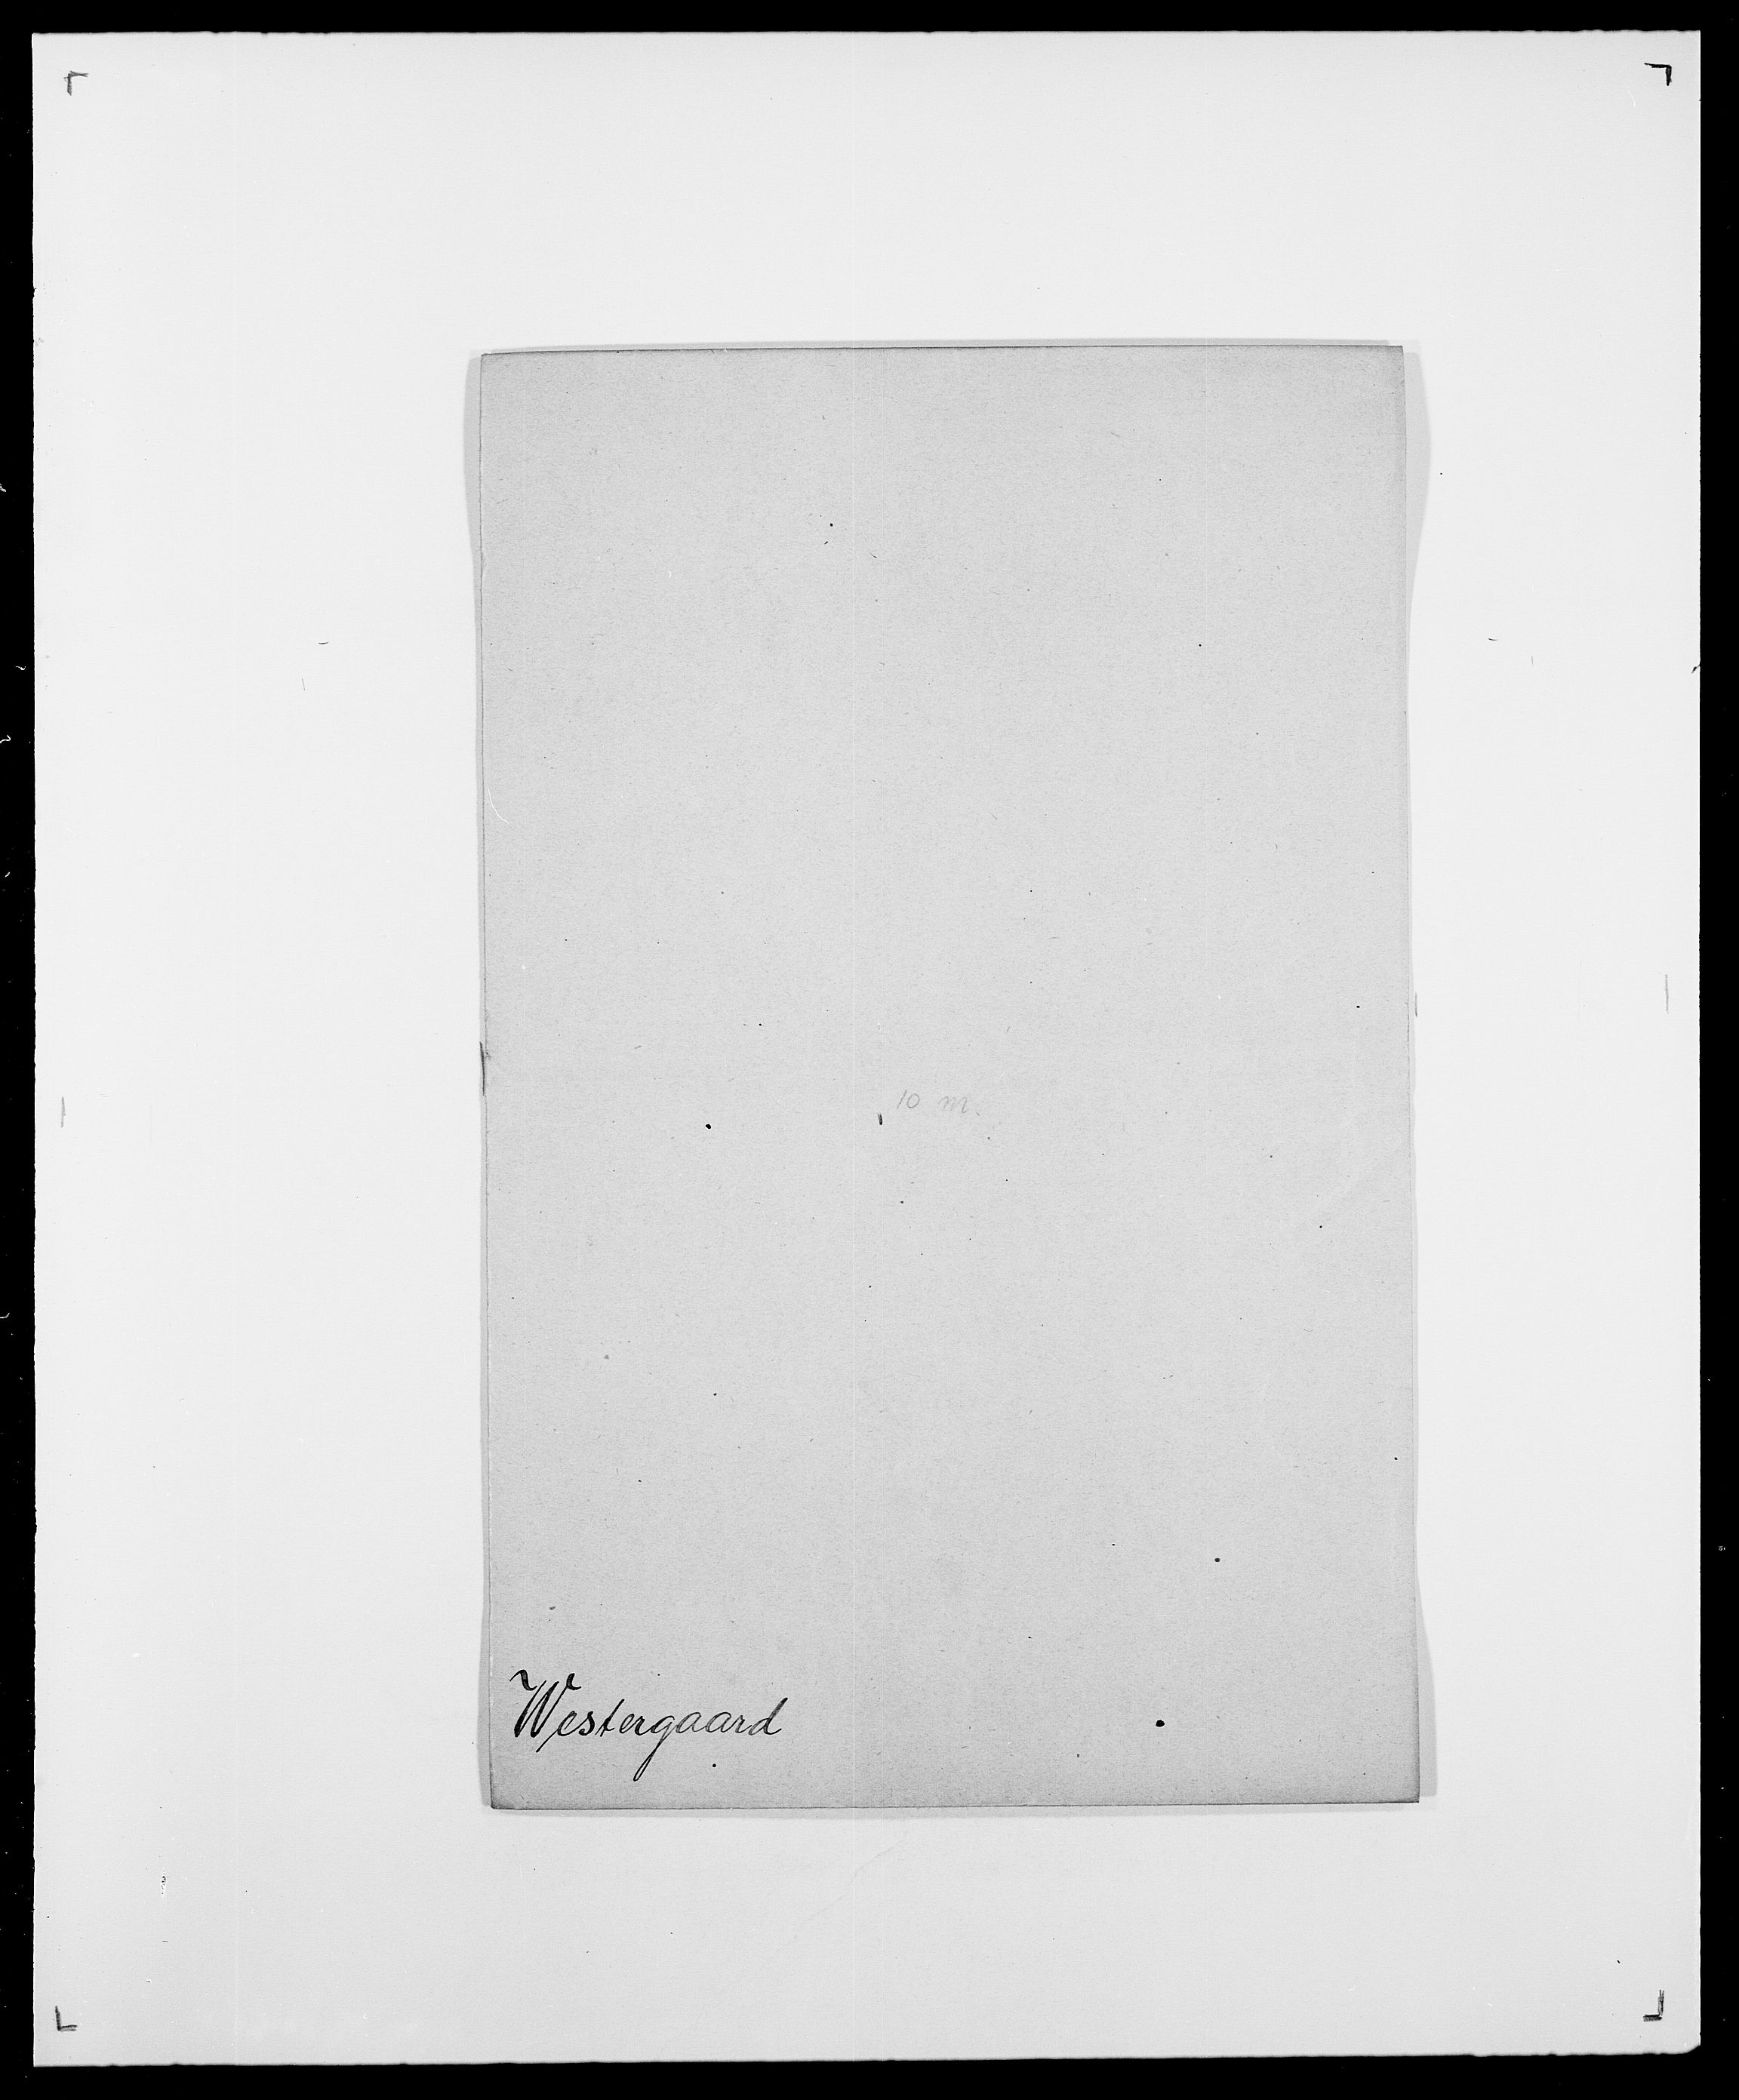 SAO, Delgobe, Charles Antoine - samling, D/Da/L0041: Vemmestad - Viker, s. 268